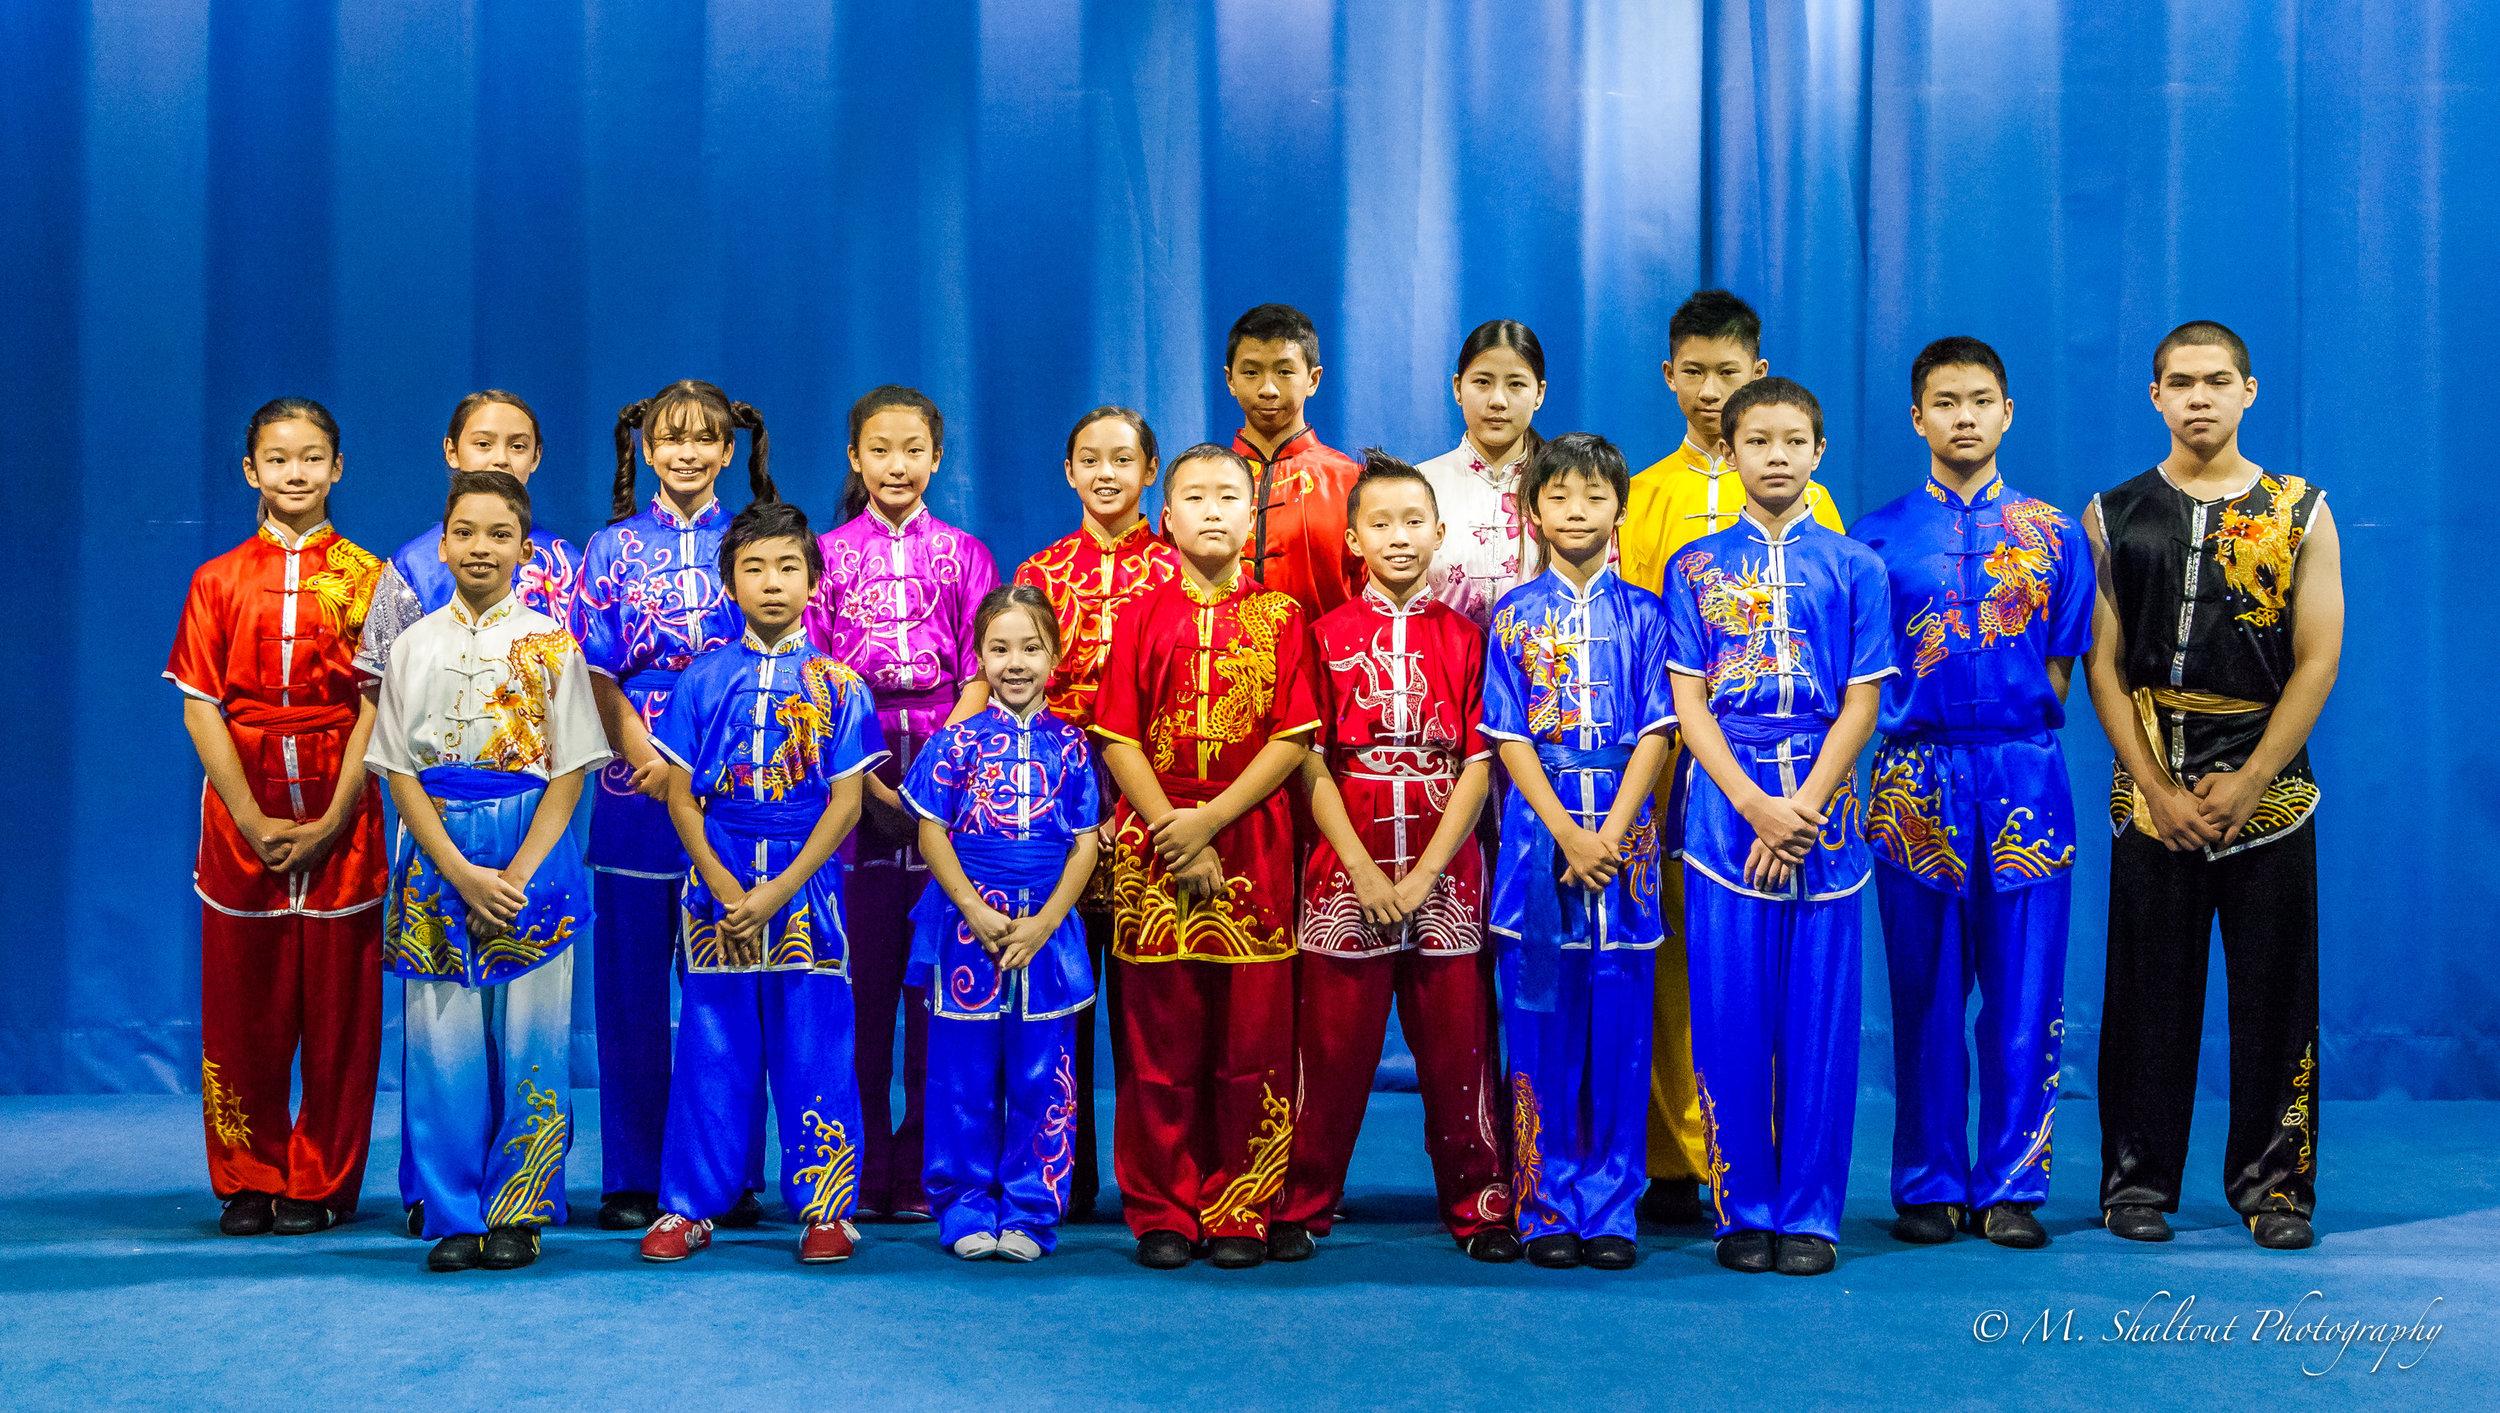 The 2016 Wayland Li competition team.